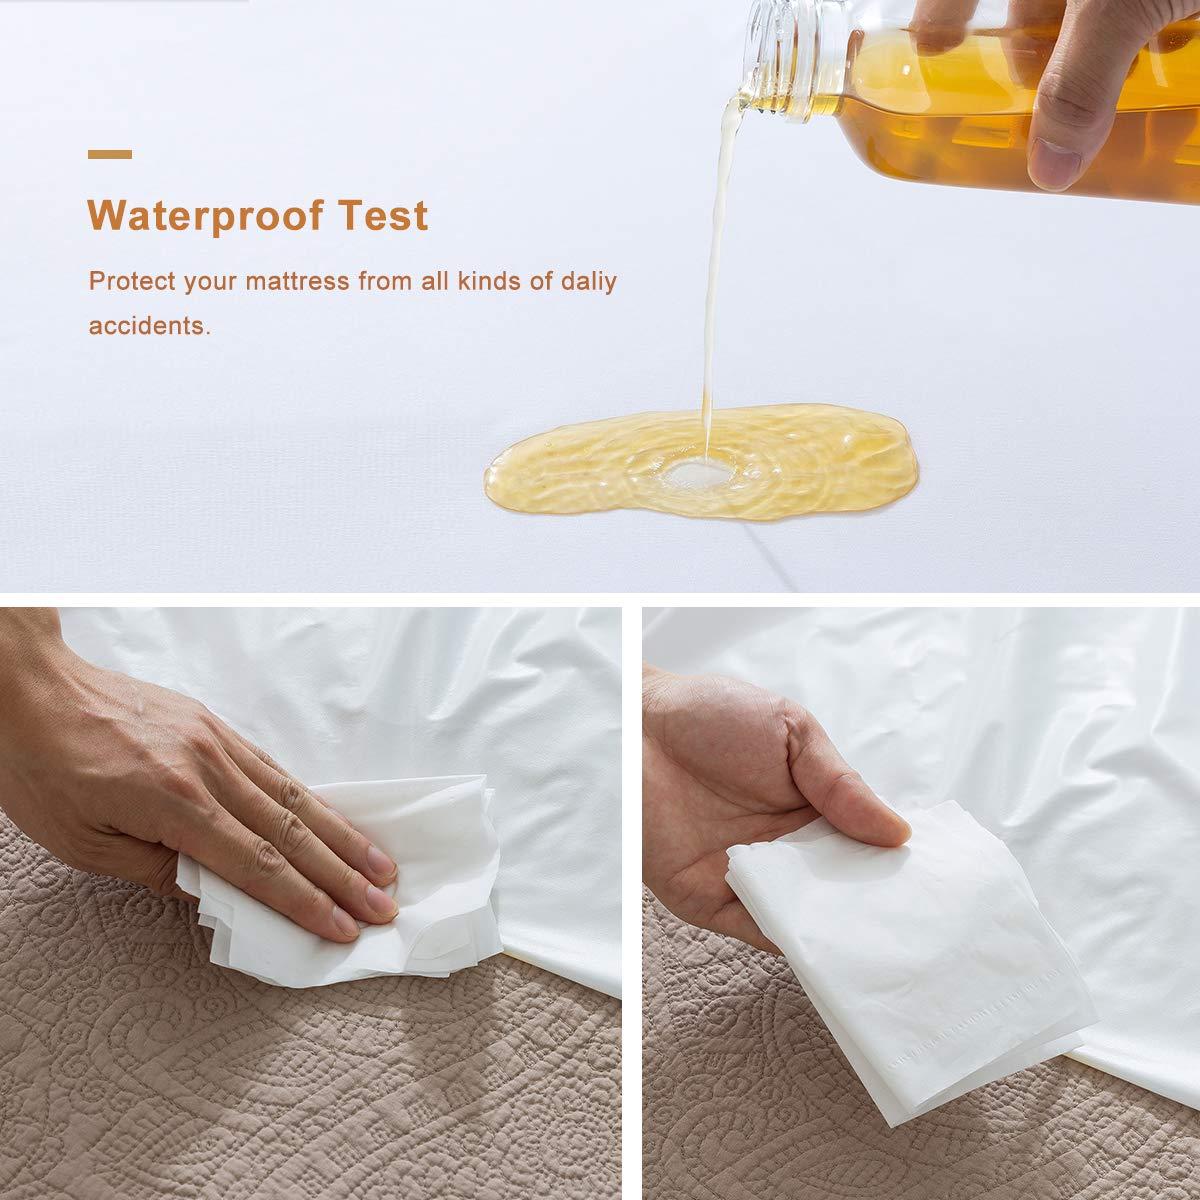 Knitting Top Vinyl Free Guher Twin Size Waterproof Mattress Protector Premium Hypoallergenic Bed Mattress Protector